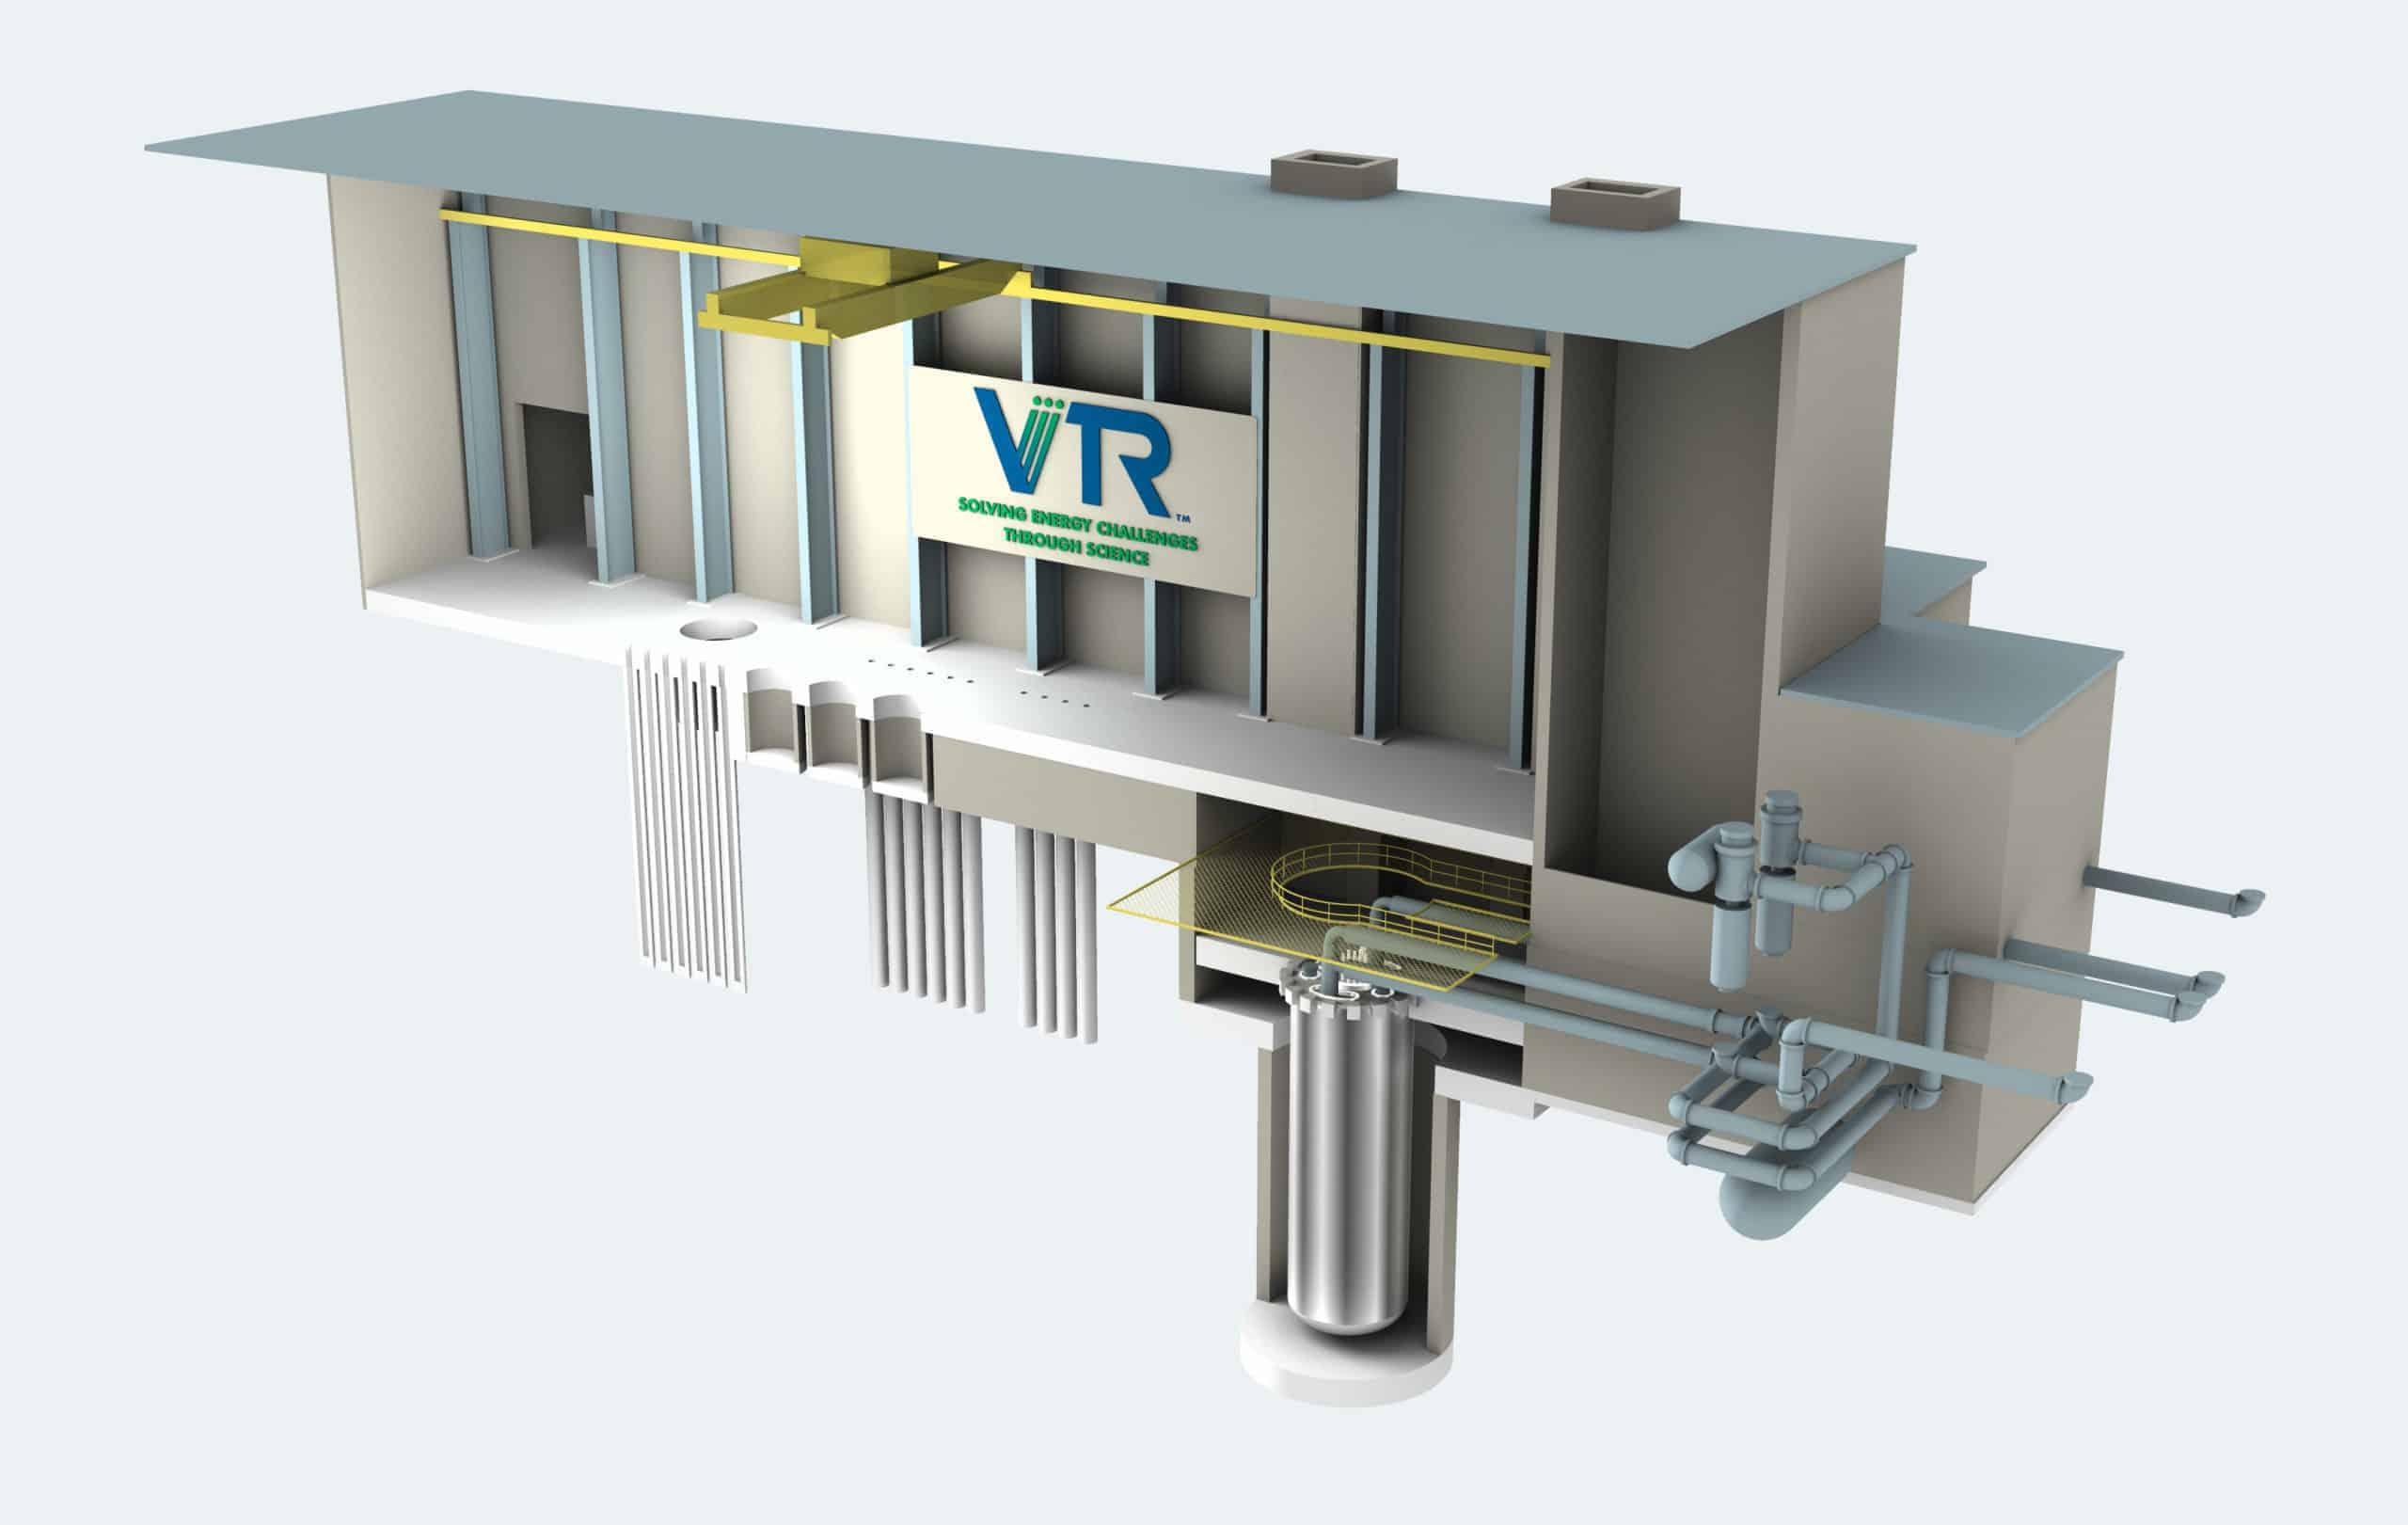 Versatile Test Reactor (VTR) facility rendering